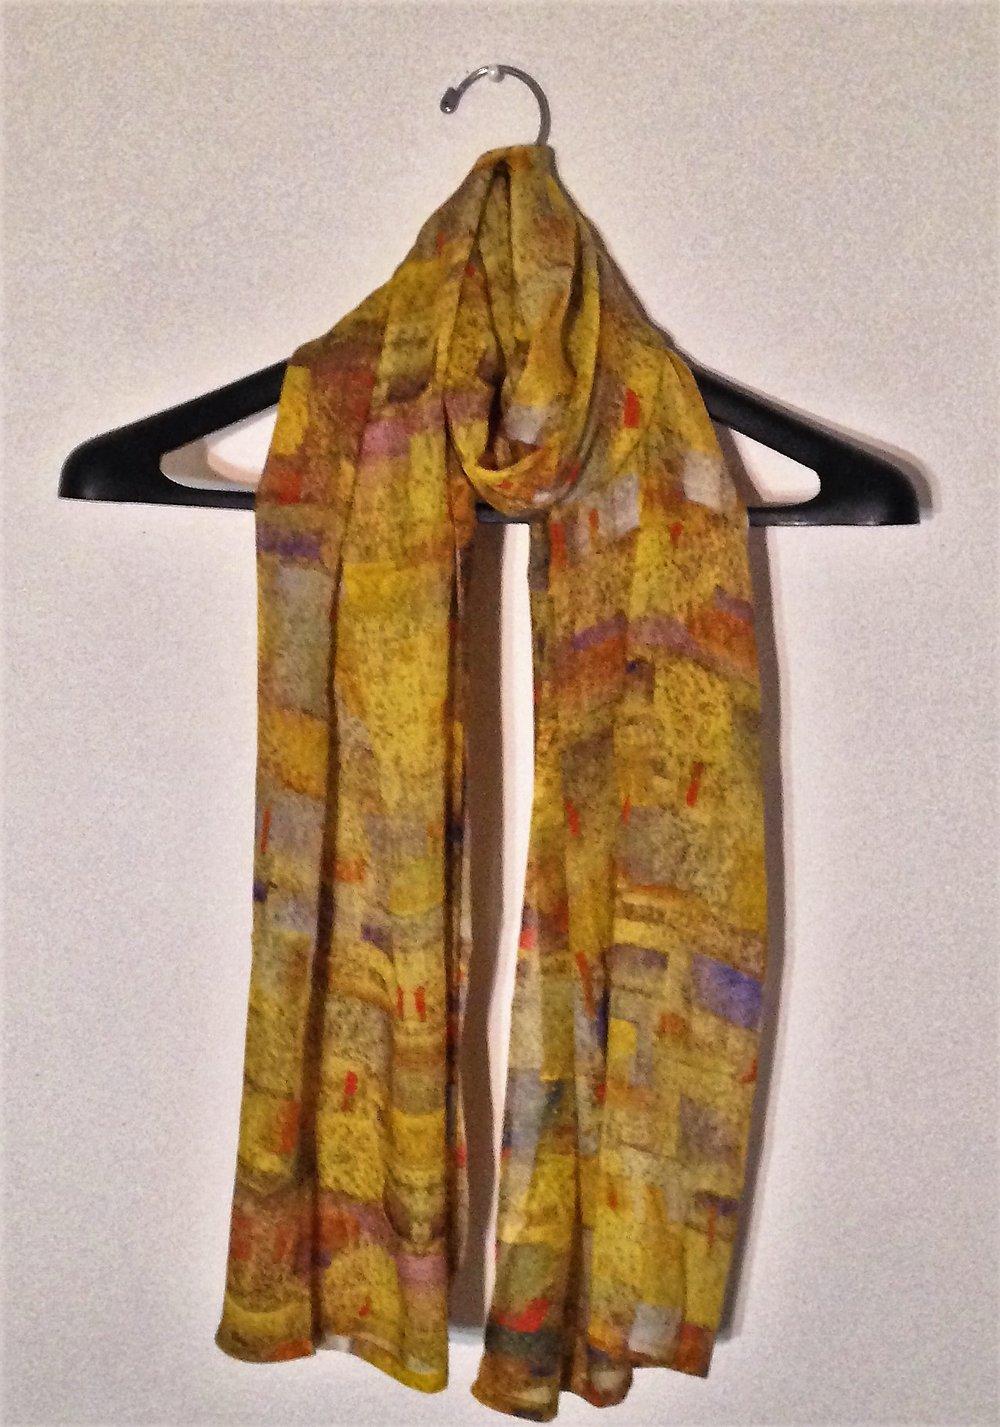 Silk Square Scarf - Yellow Rose Scarf by VIDA VIDA lrlk6